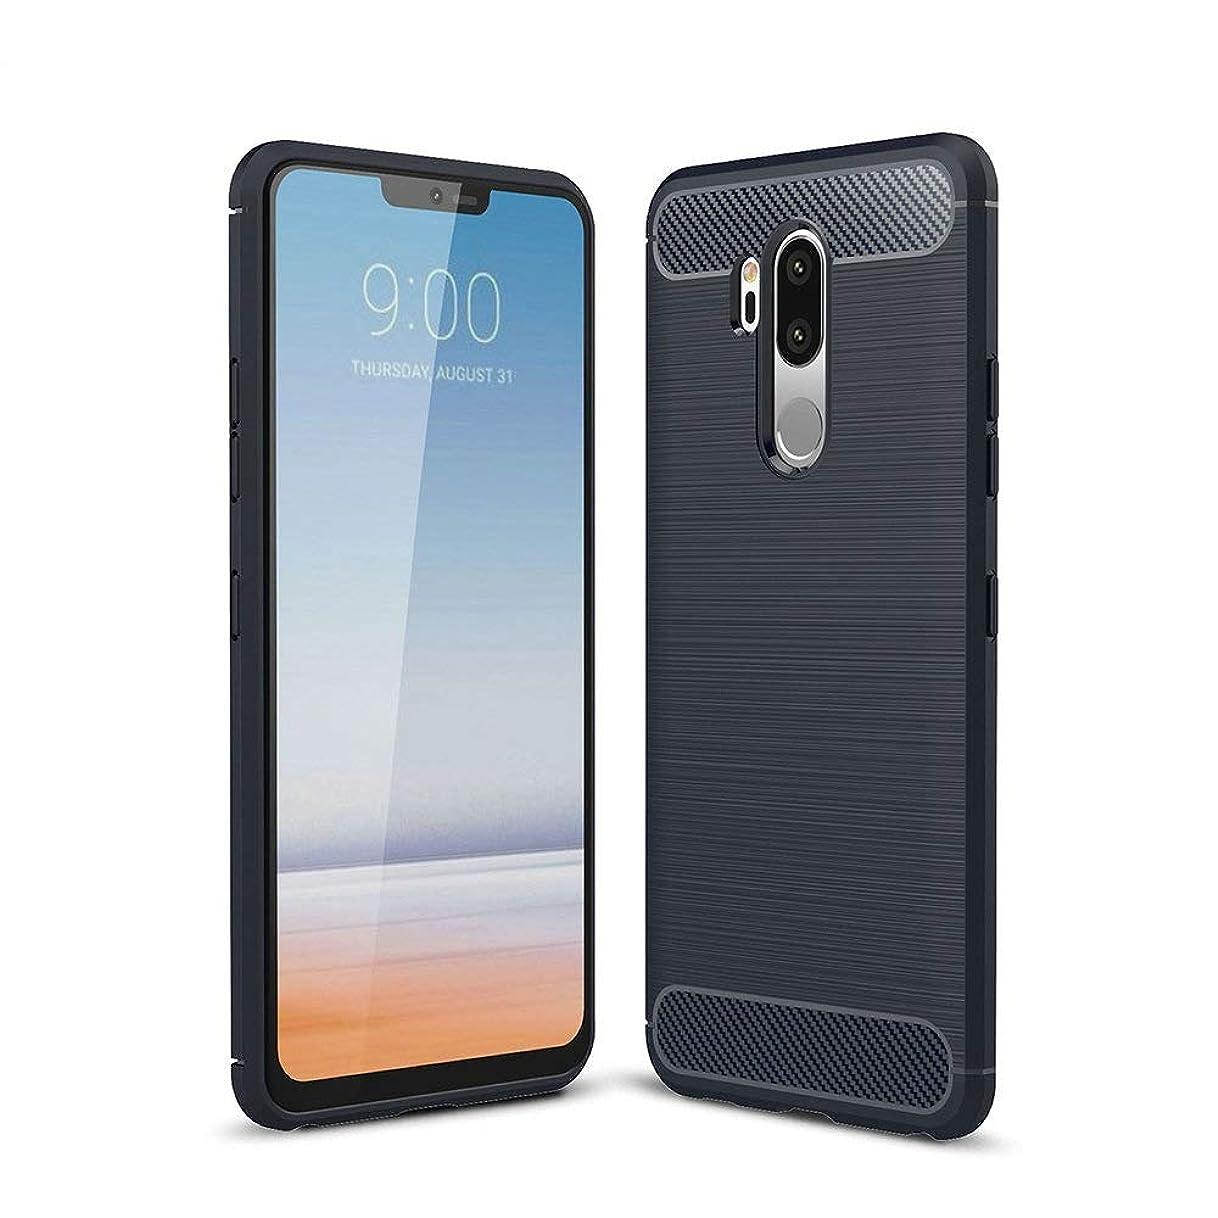 YiOne Android One X5 モバイルシェル 携帯電話 PUレザー 薄型、耐衝撃性、耐摩耗性、傷にも強い、シンプル、ソフトシェル 専用 保護 ケース Y!mobile Androidone X5 専用 (ブラック)